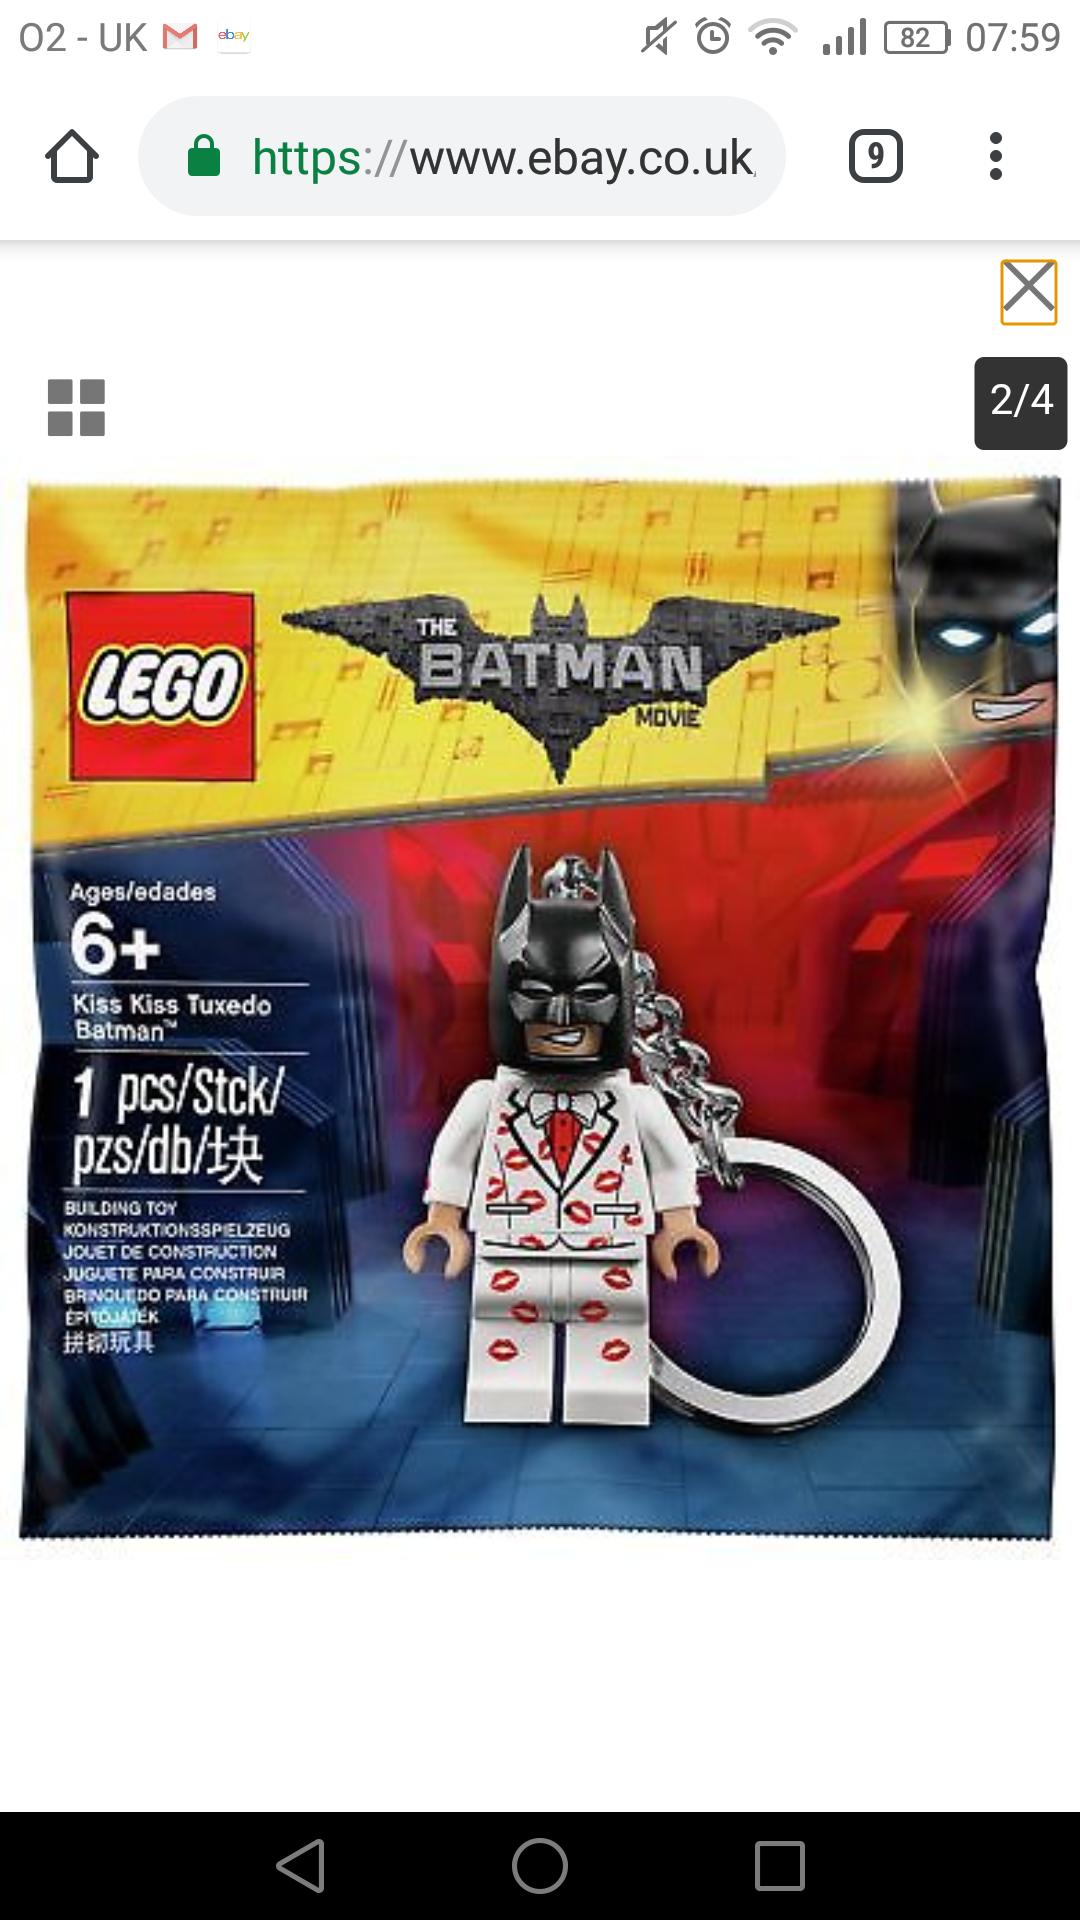 Lego batman keyring free delivery £2.49 @ Argos on eBay